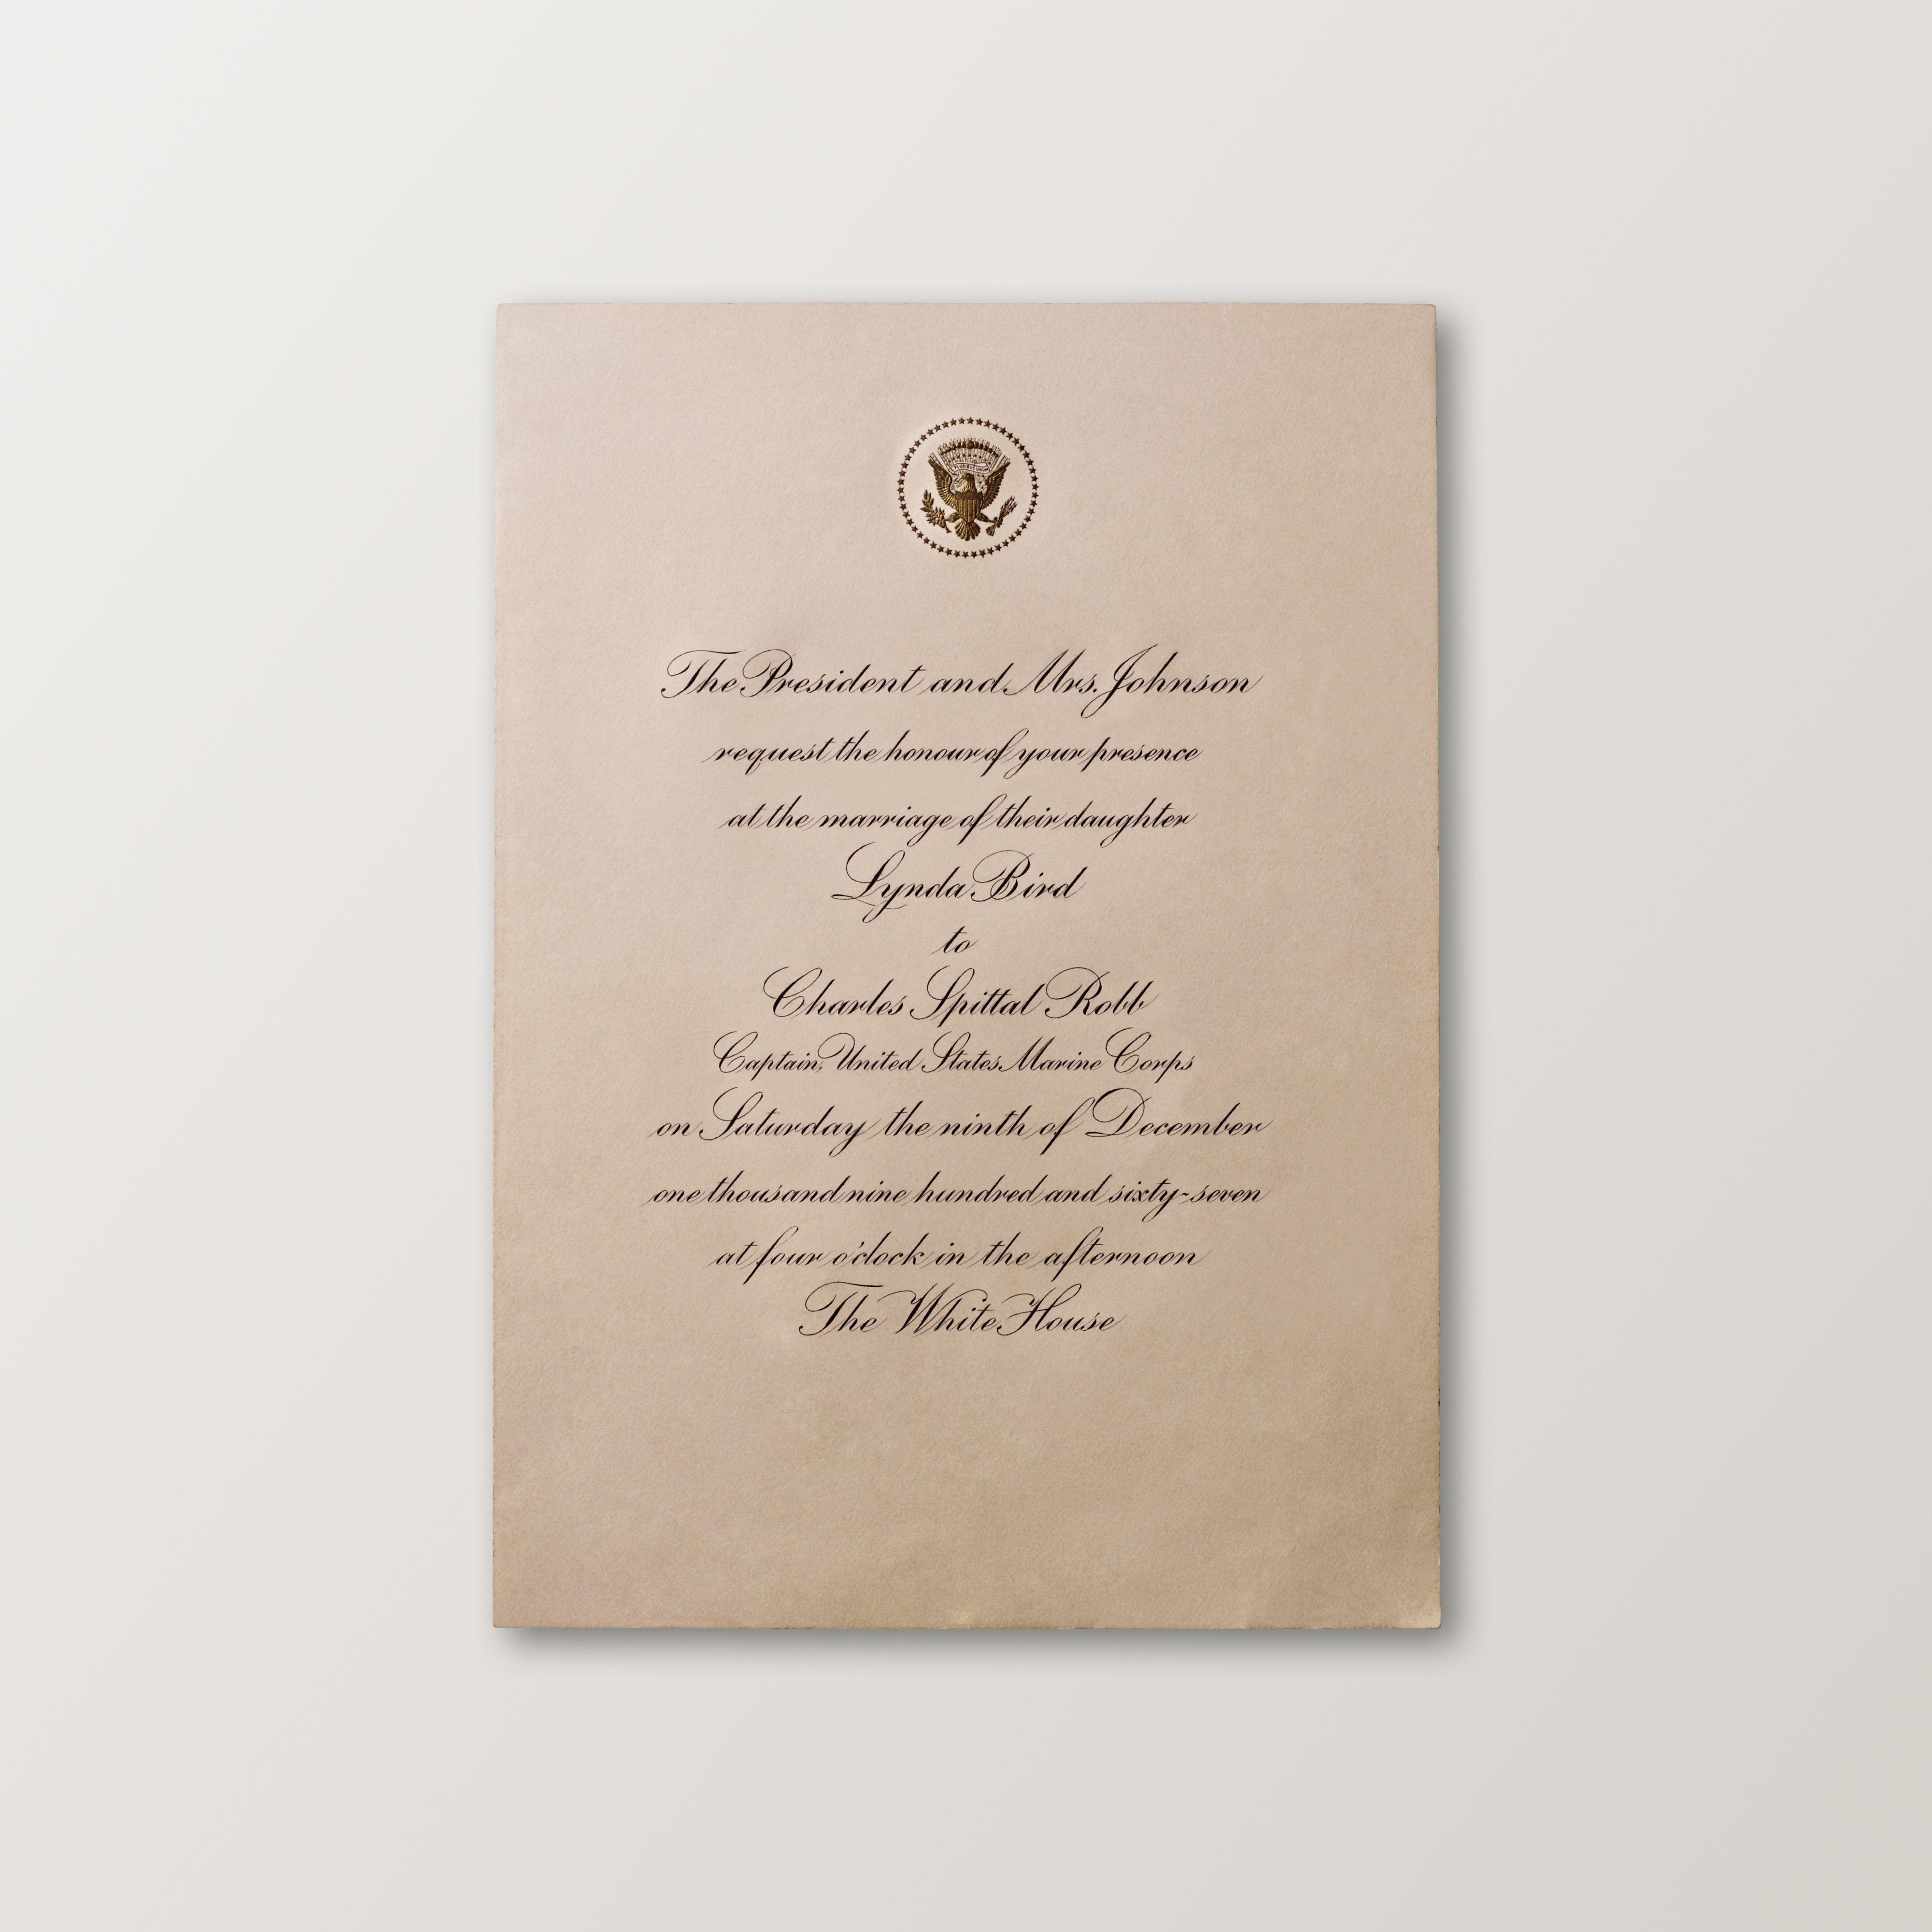 The wedding invitation for President Johnsonu0027s daughter